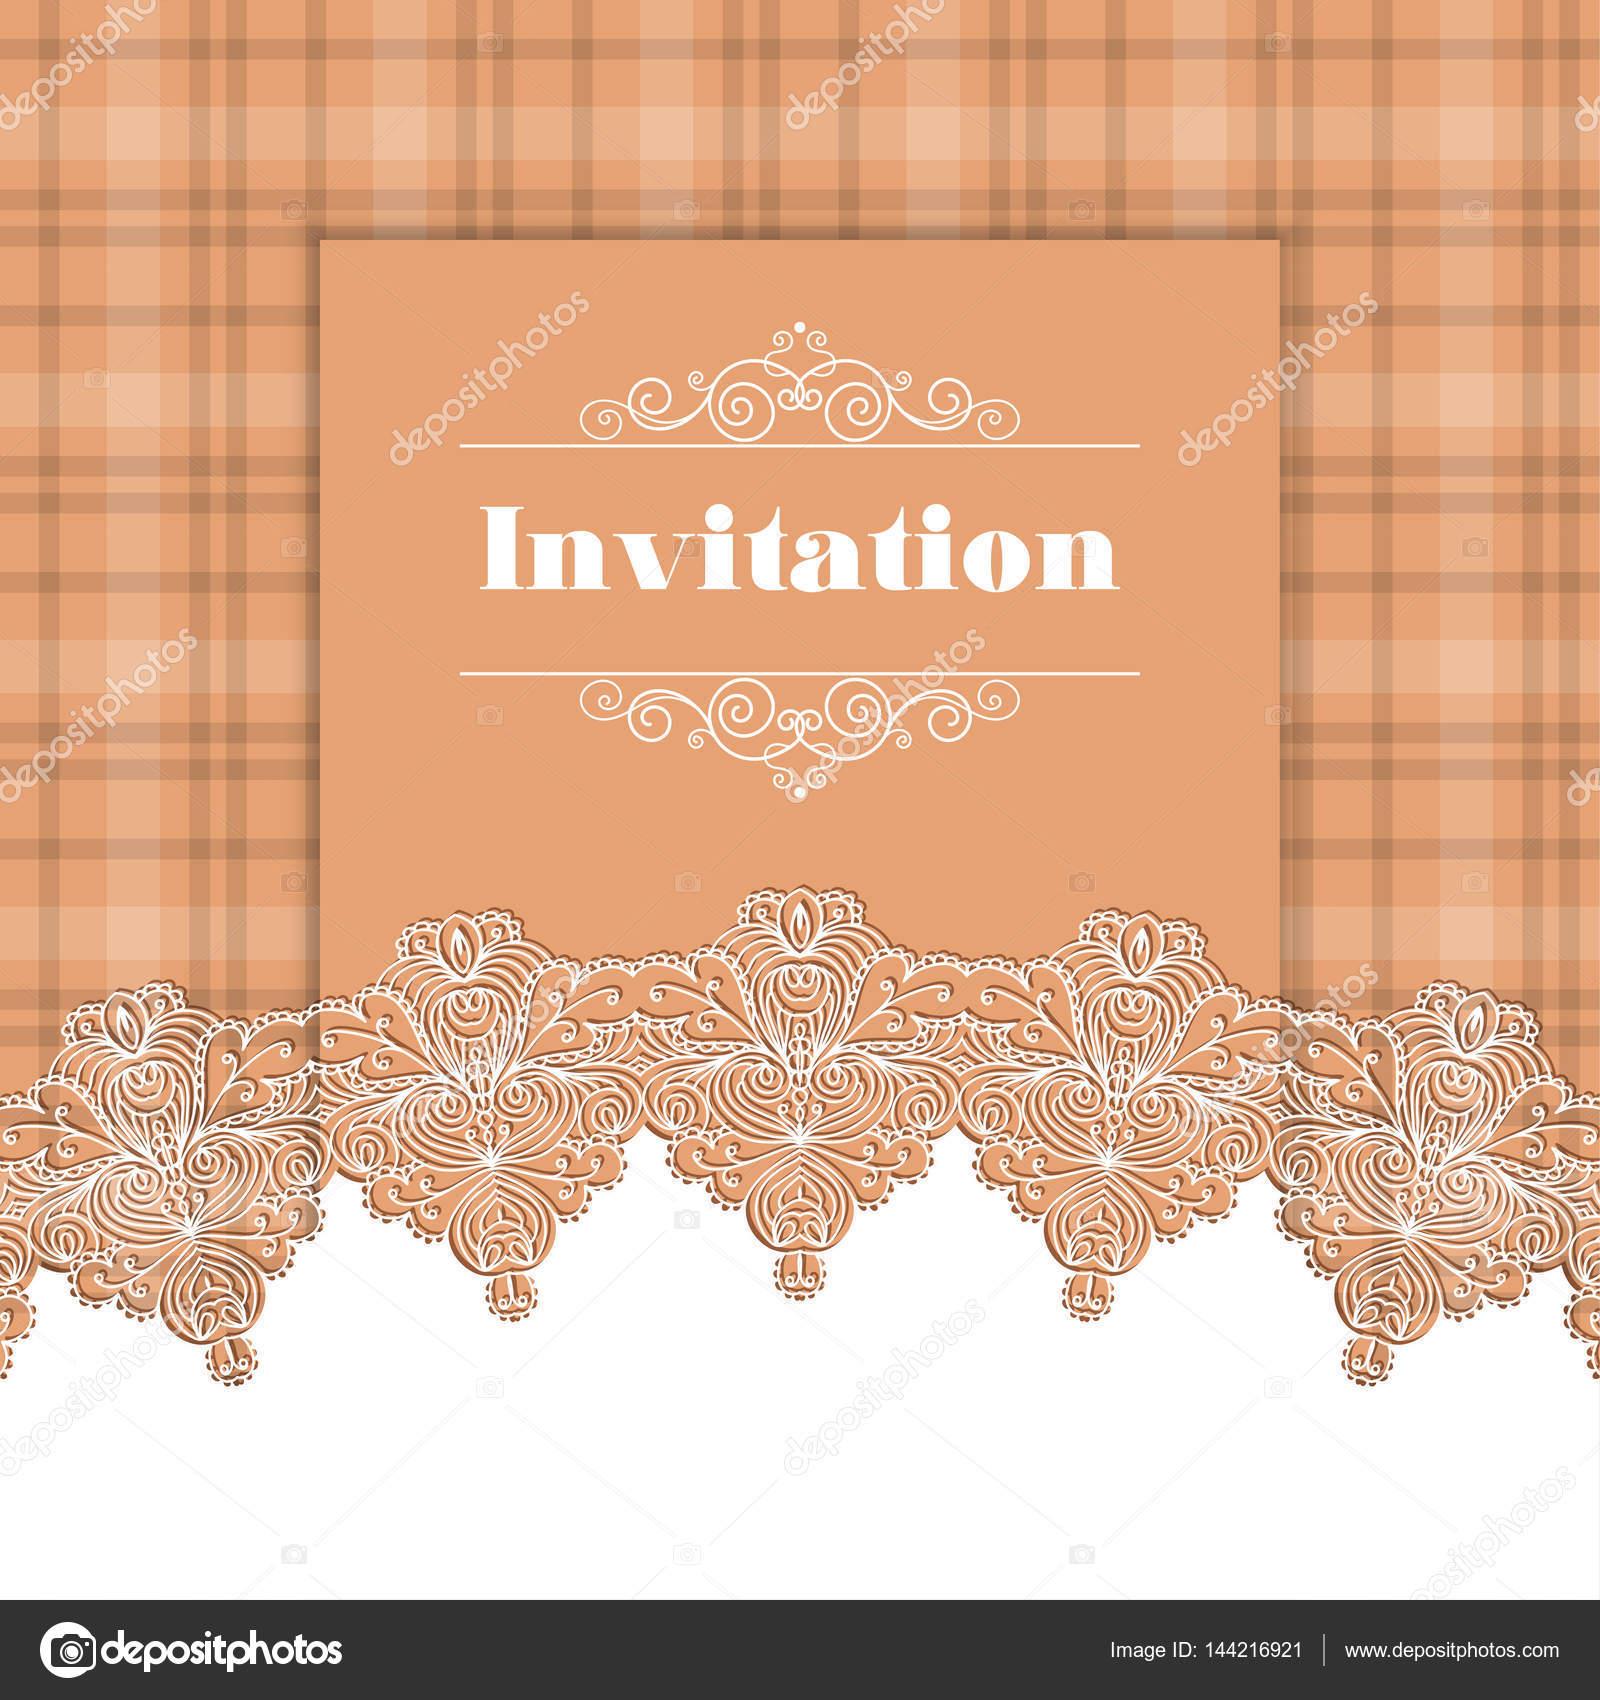 invitation template with lace border stock vector nonikastar